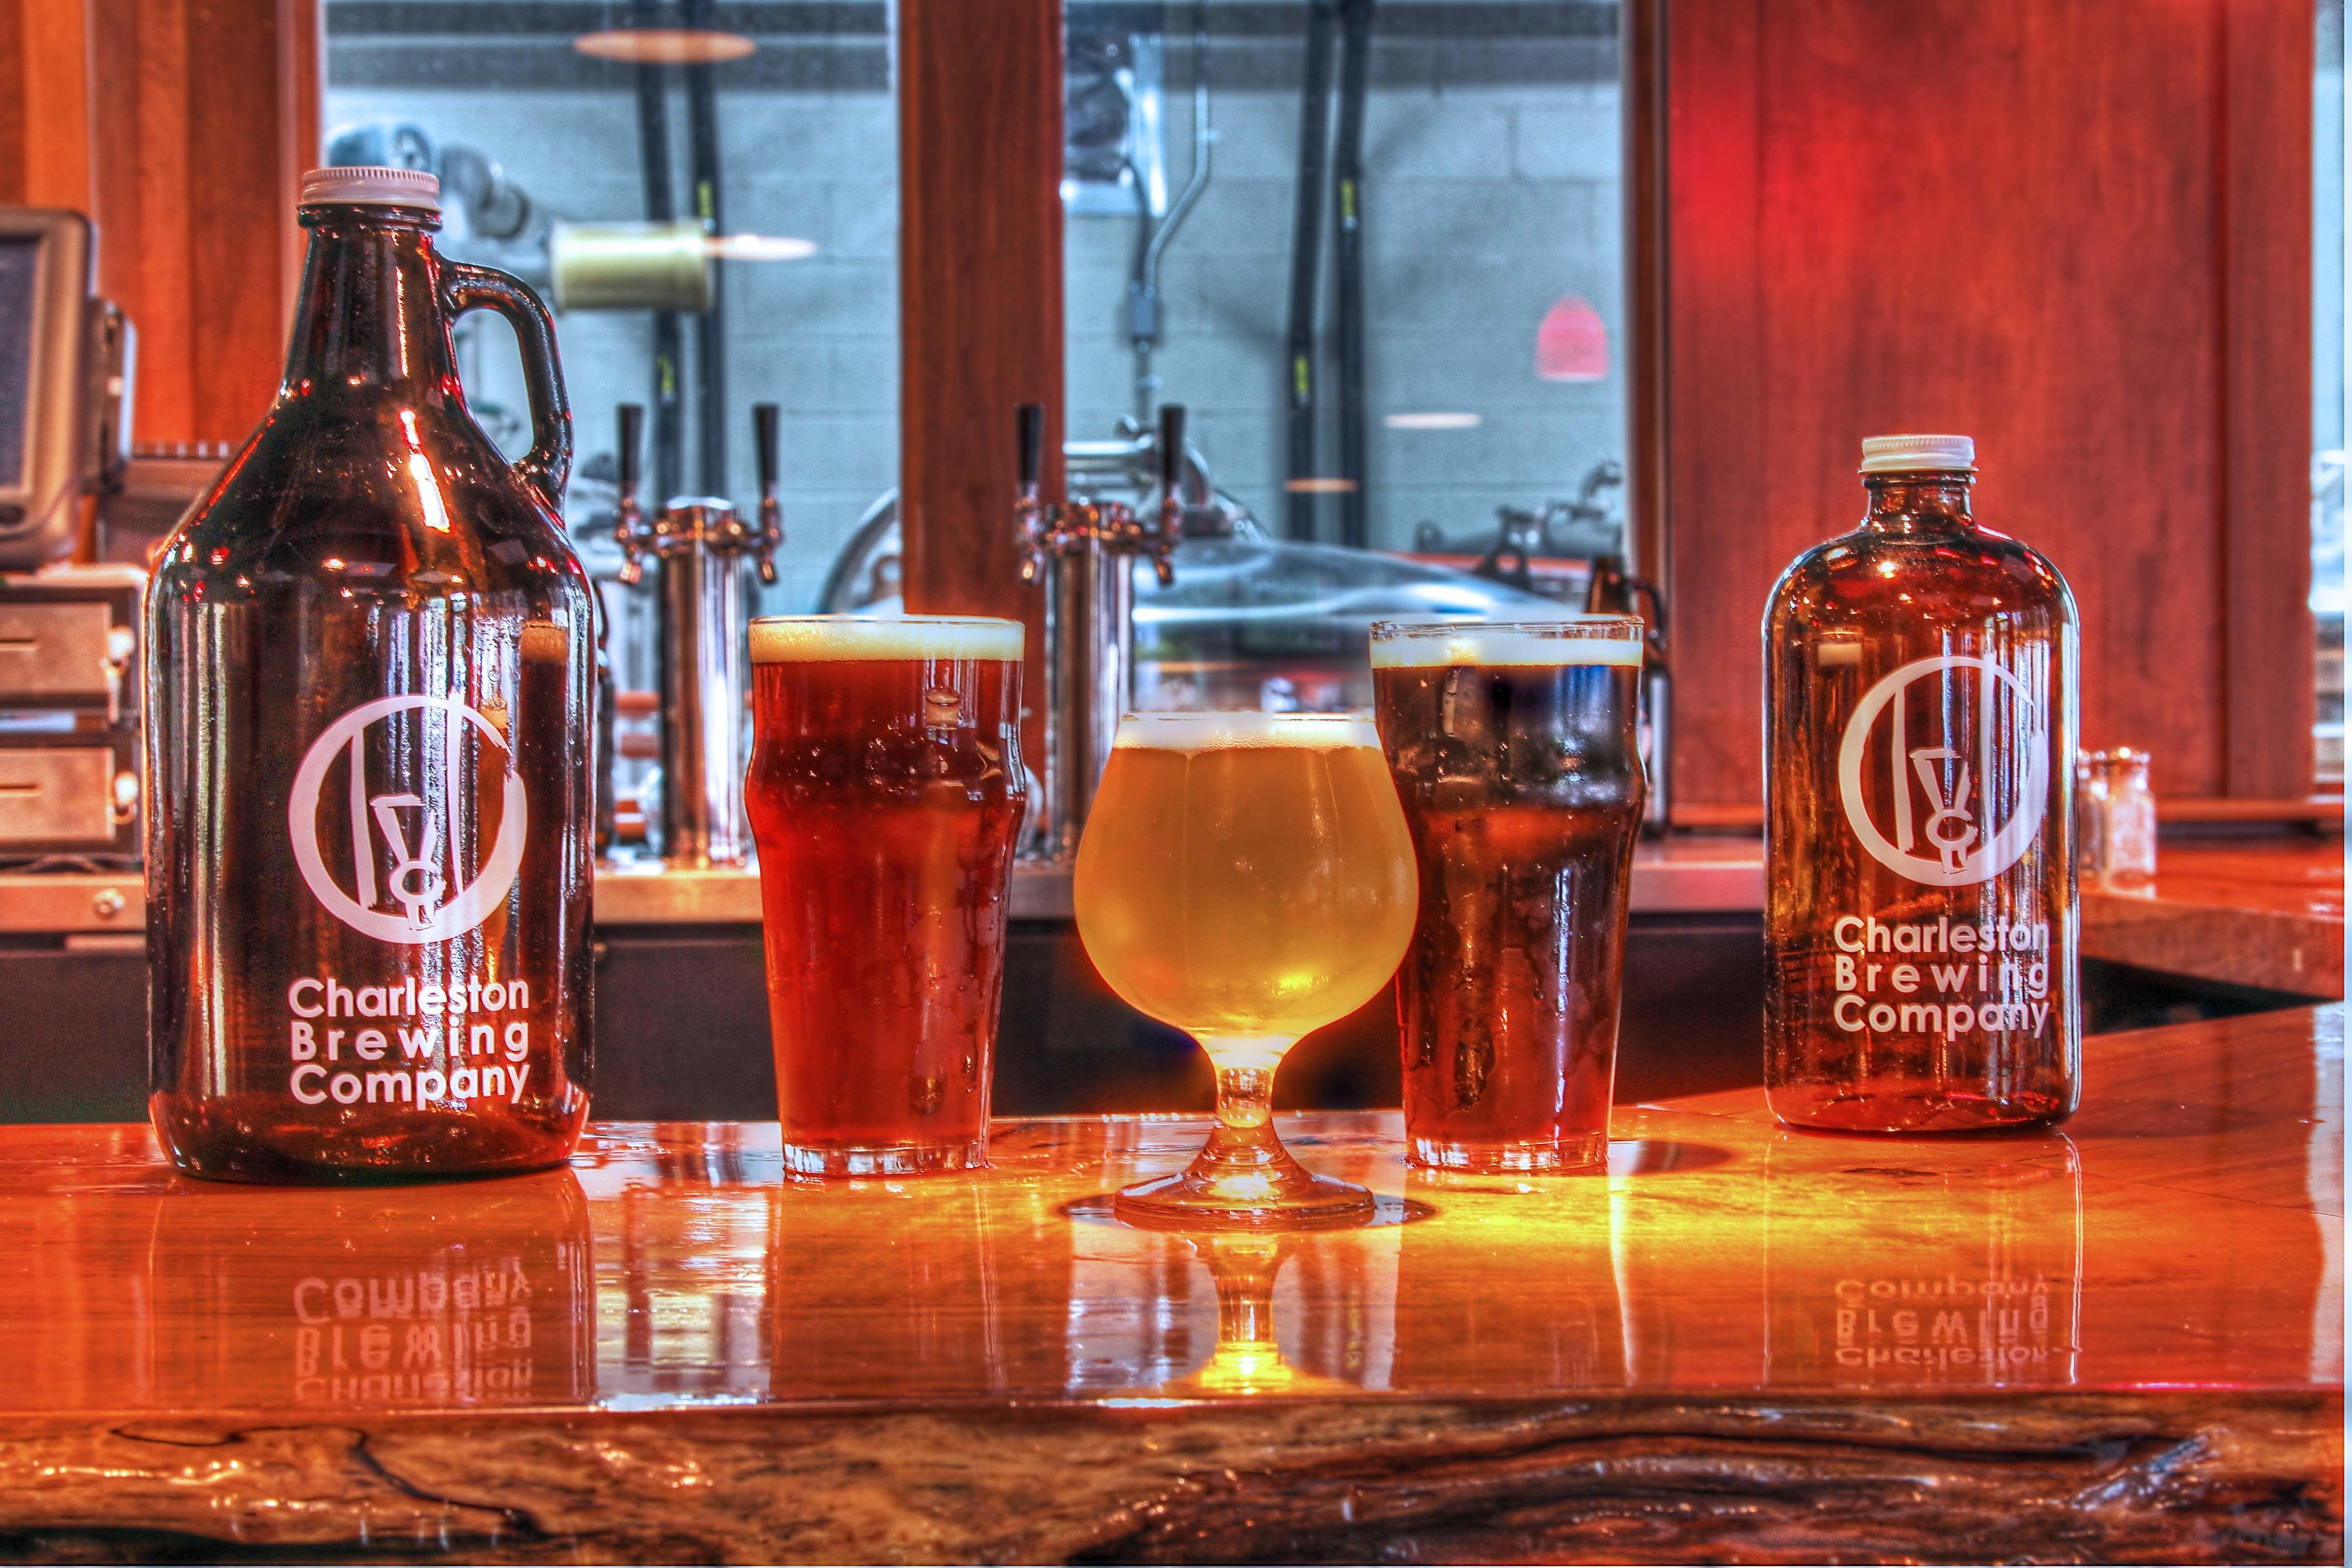 Charleston brewing company brewing company brewing brewery